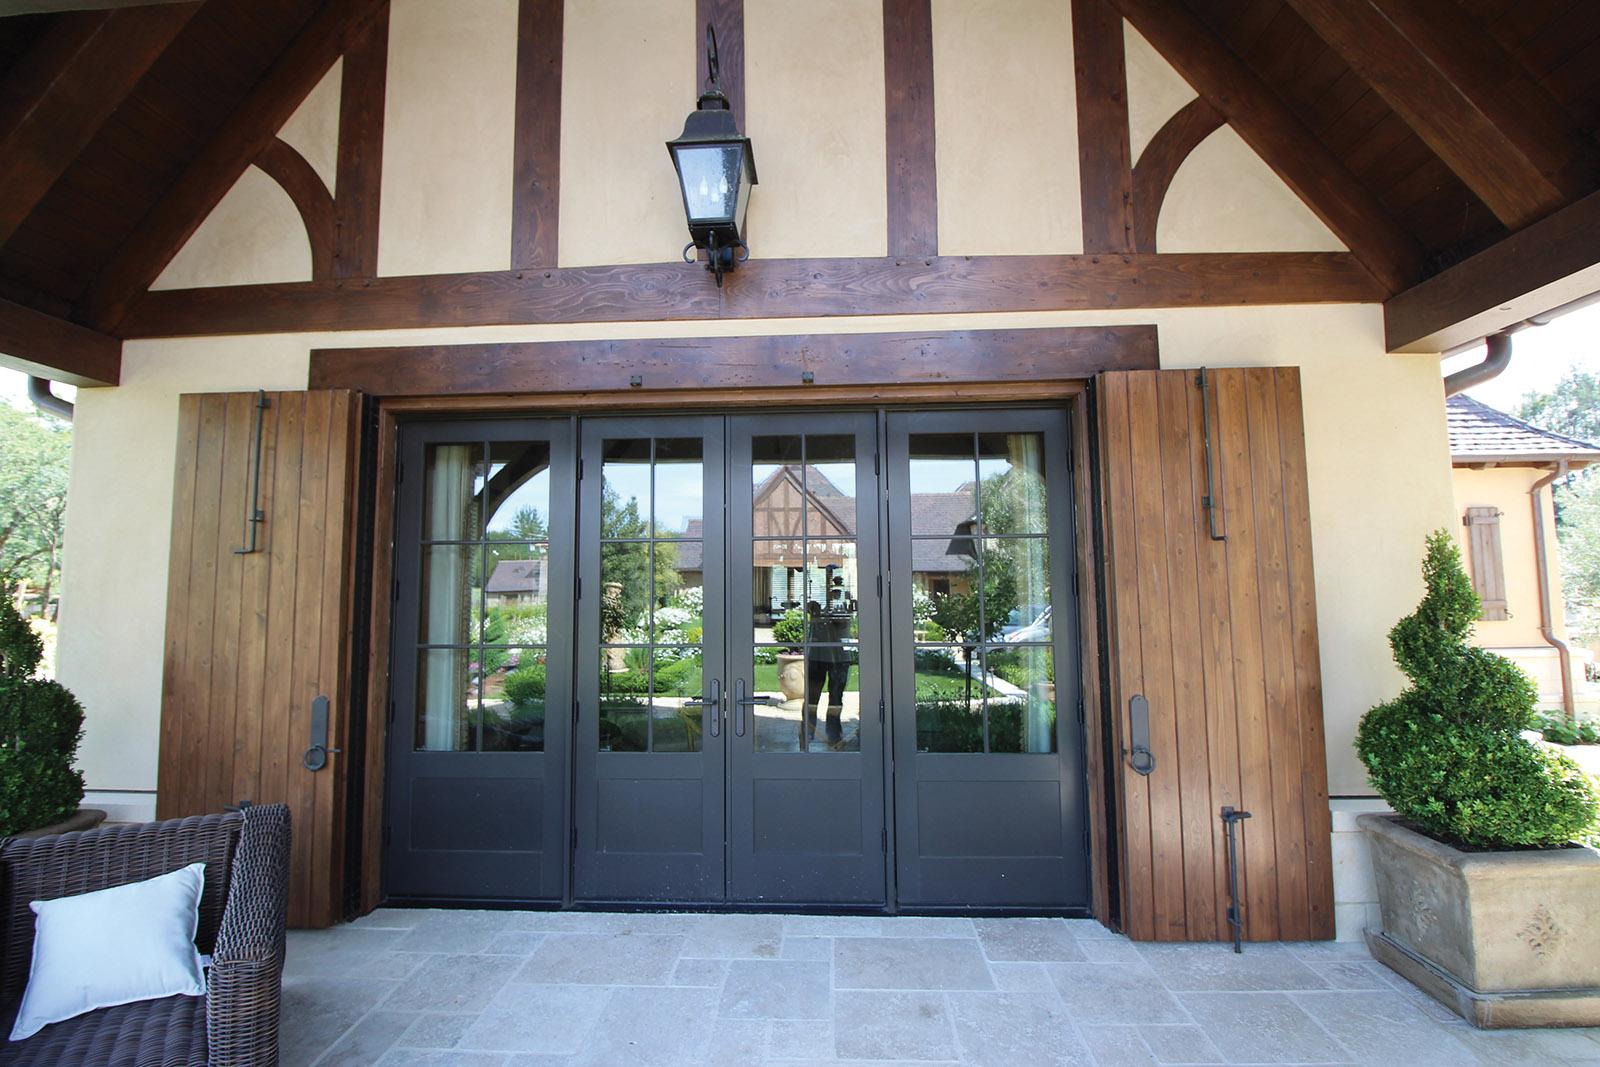 HEALDSBURG, CALIFORNIA WINERY: DOOR SYSTEM